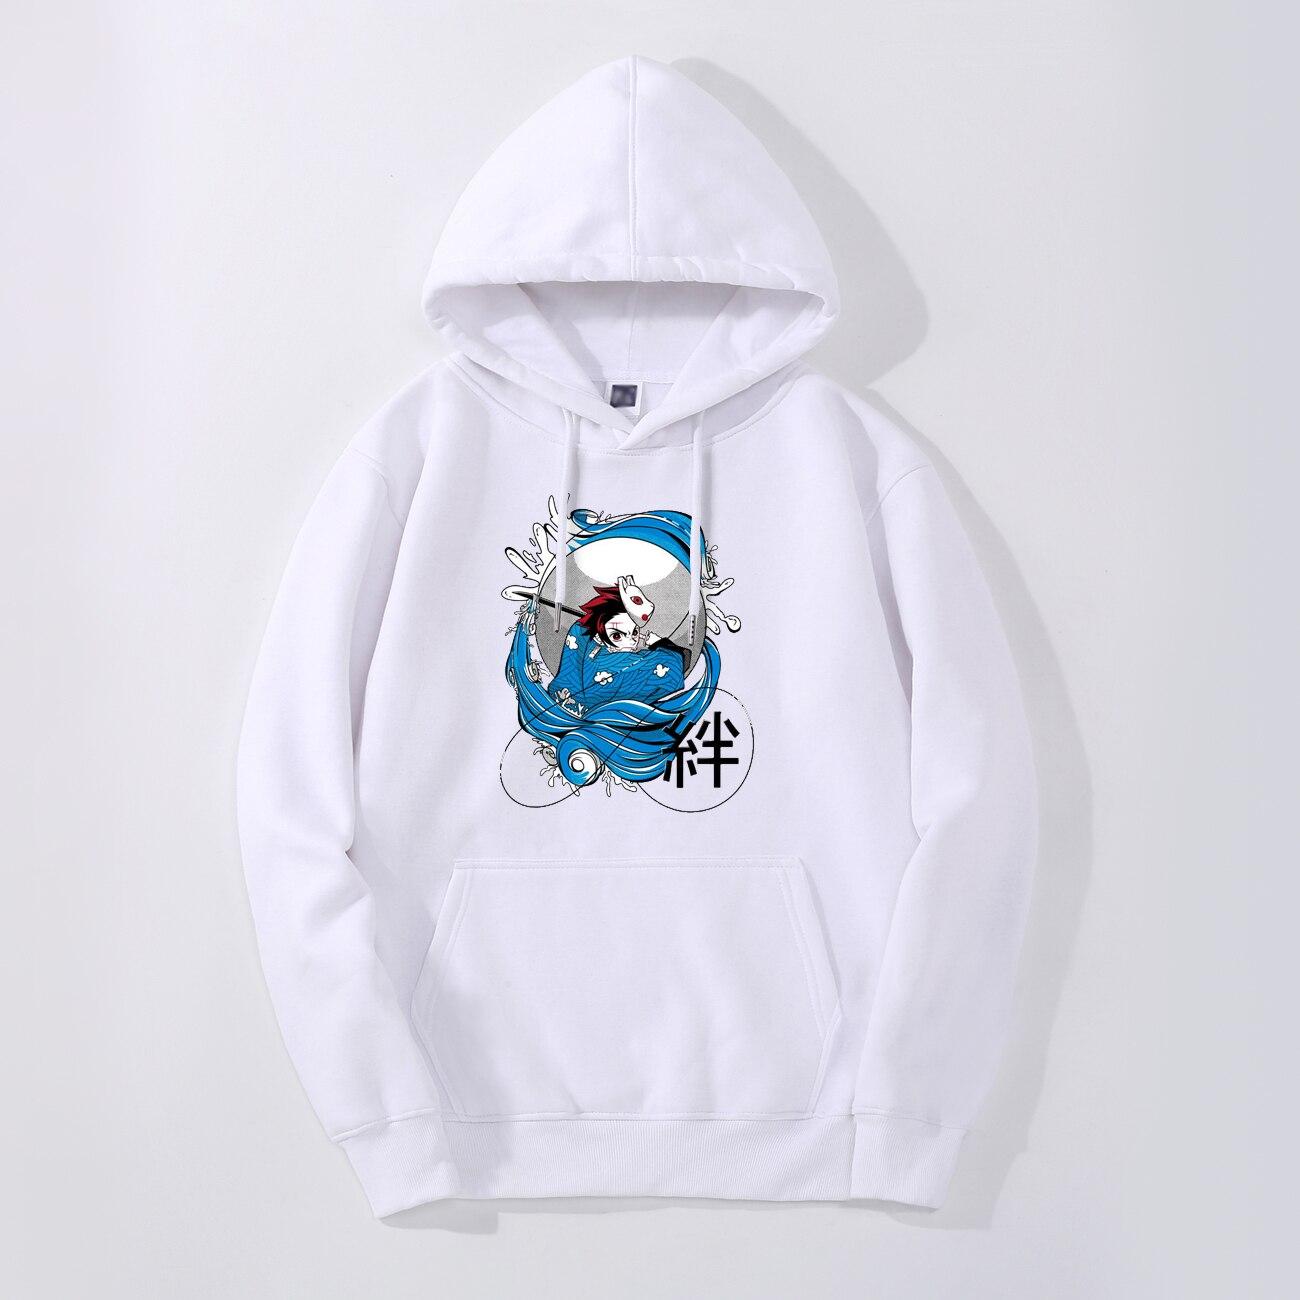 Demon Slayer Kimetsu No Yaiba Men Hoodies Sweatshirt Fleece Hooded Autumn Winter Streetwear Warm Casual Bonds Japan Anime Hoodie